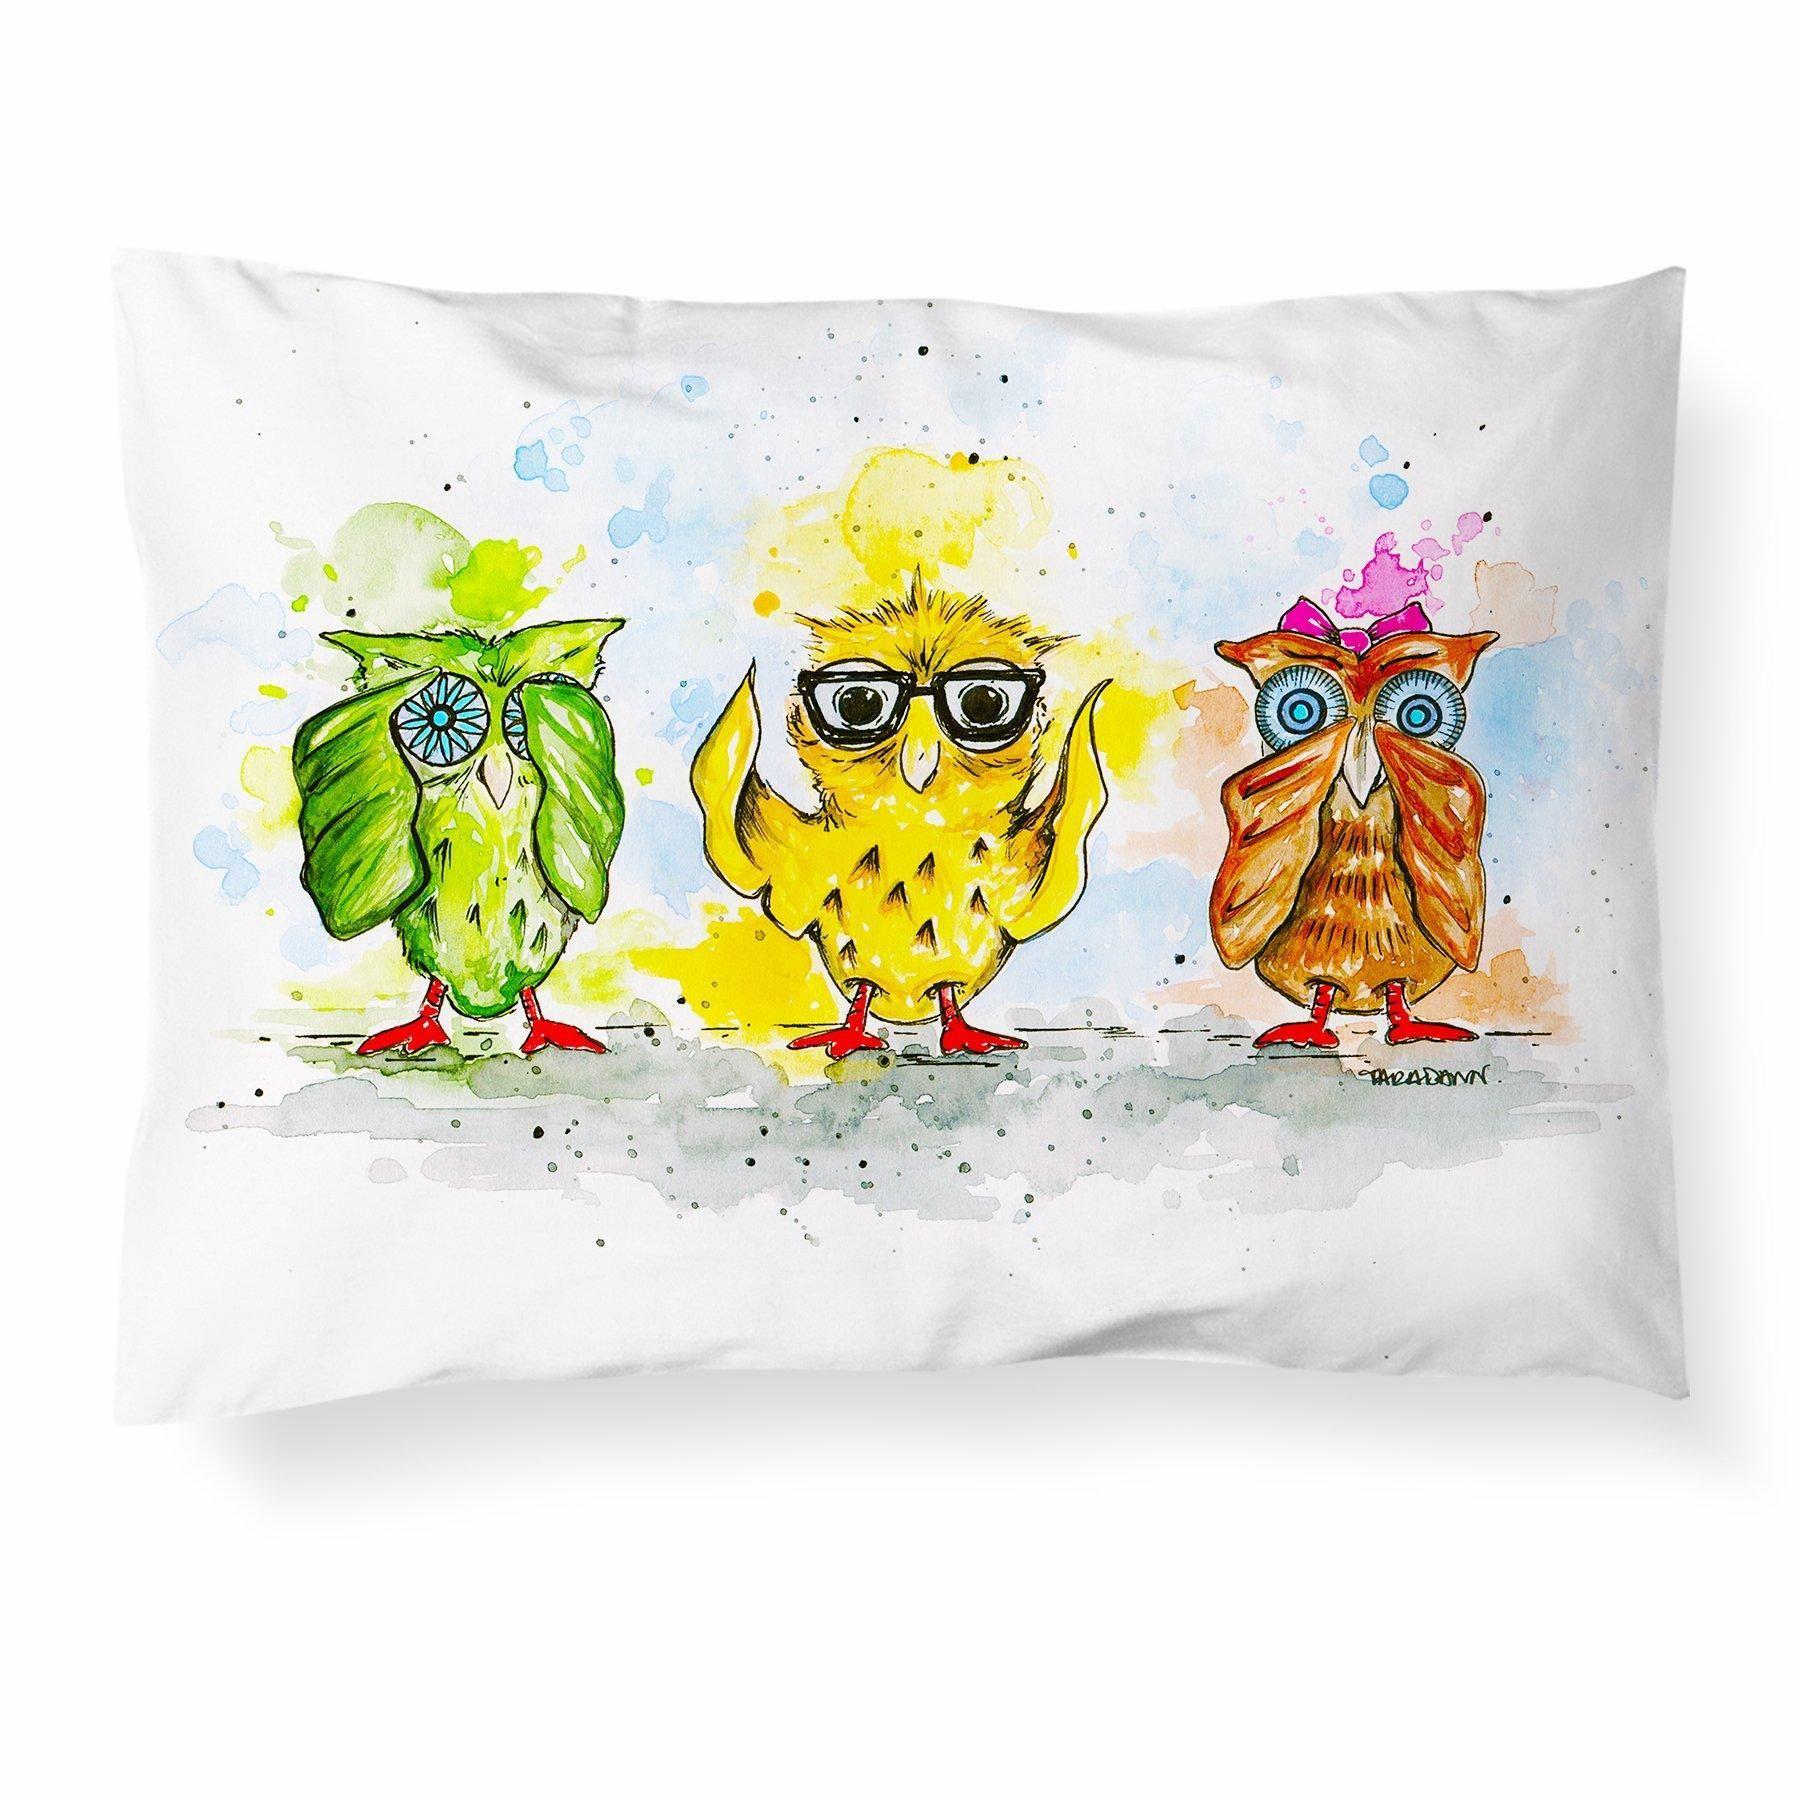 Three Little Owls Pillowcase